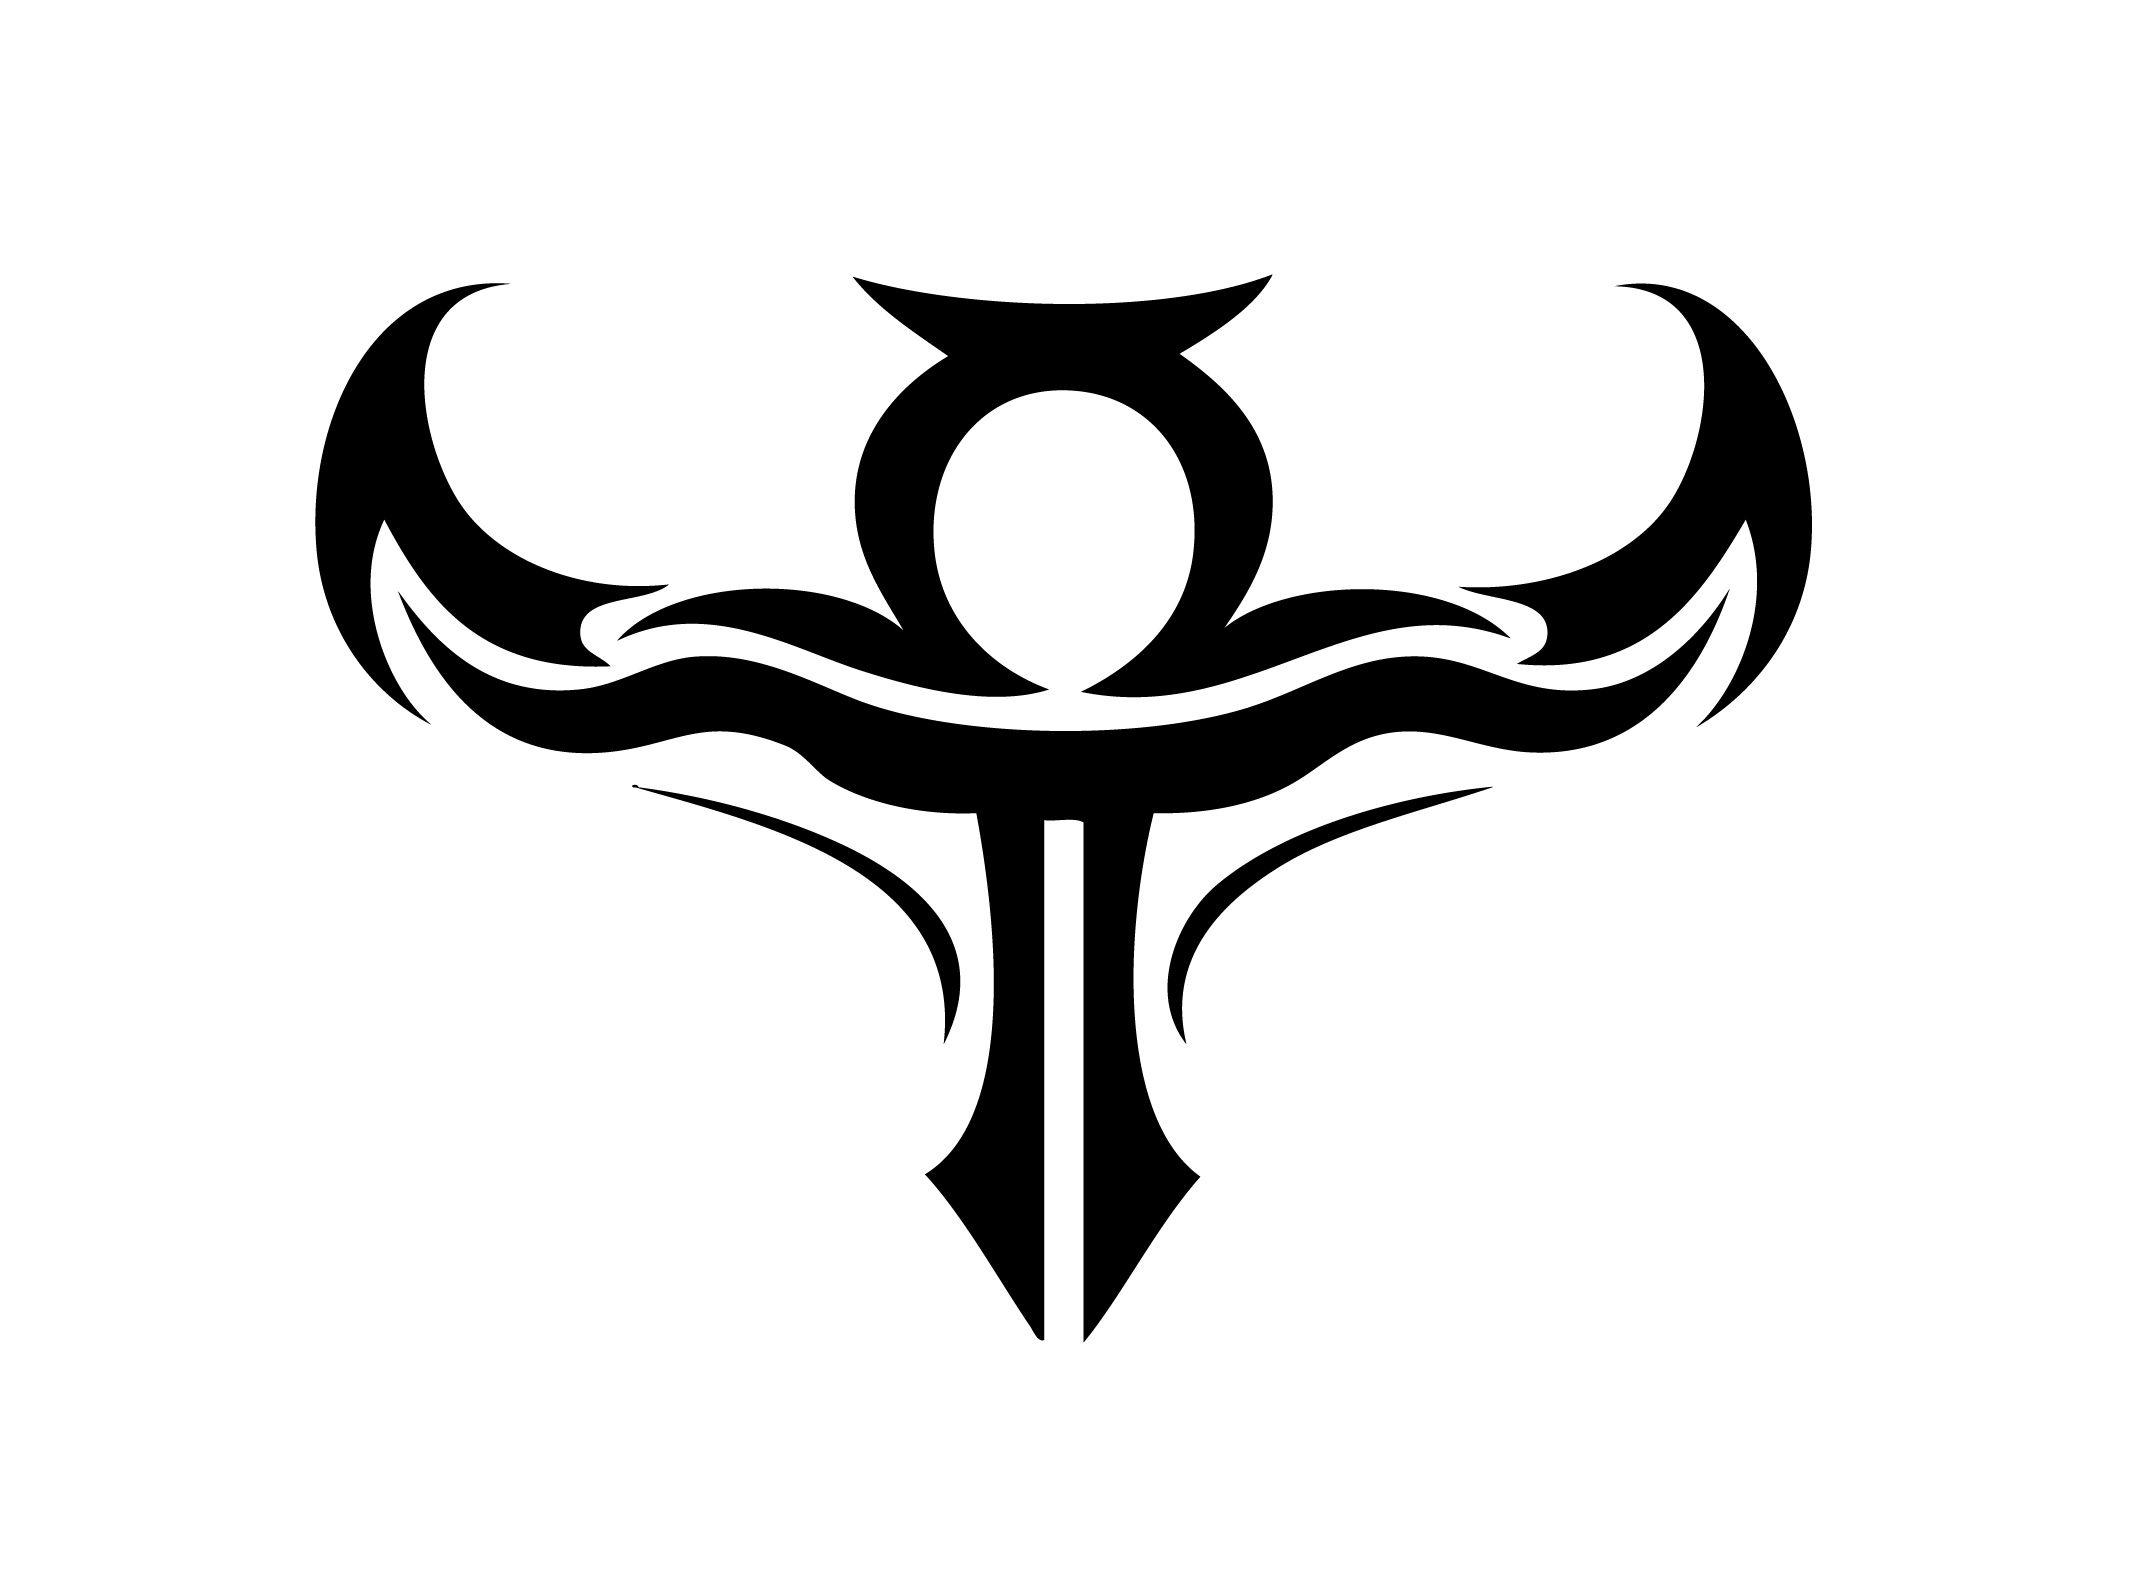 Cronus greek god symbol image collections symbol and sign ideas greek gods symbols of power images symbol and sign ideas latest 21321583 gaia pinterest symbols latest biocorpaavc